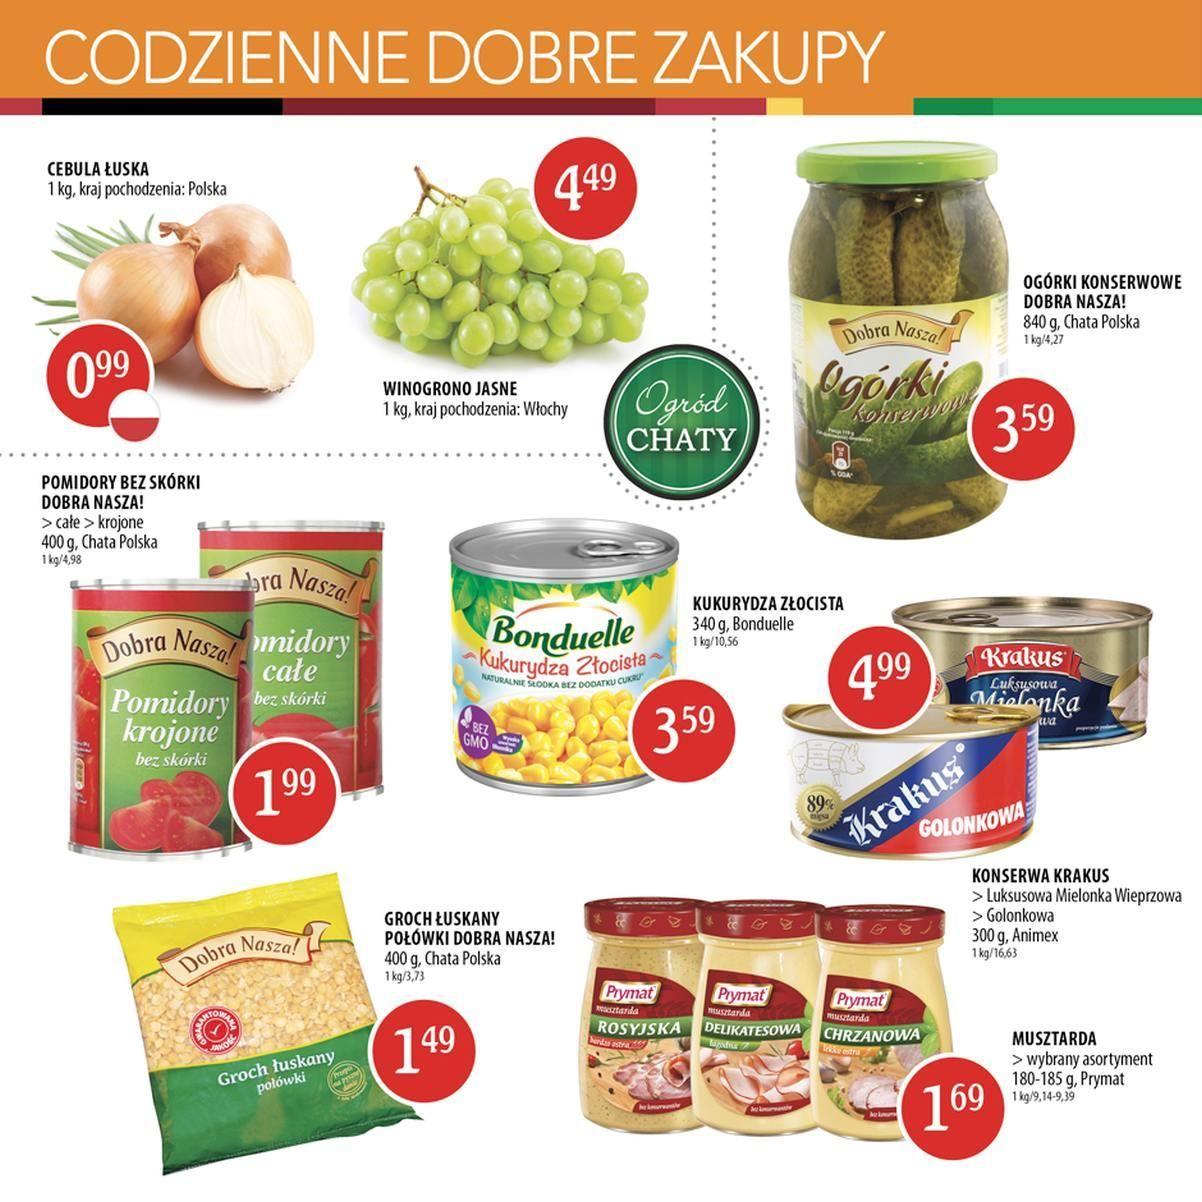 Gazetka promocyjna Chata Polska do 28/09/2016 str.3